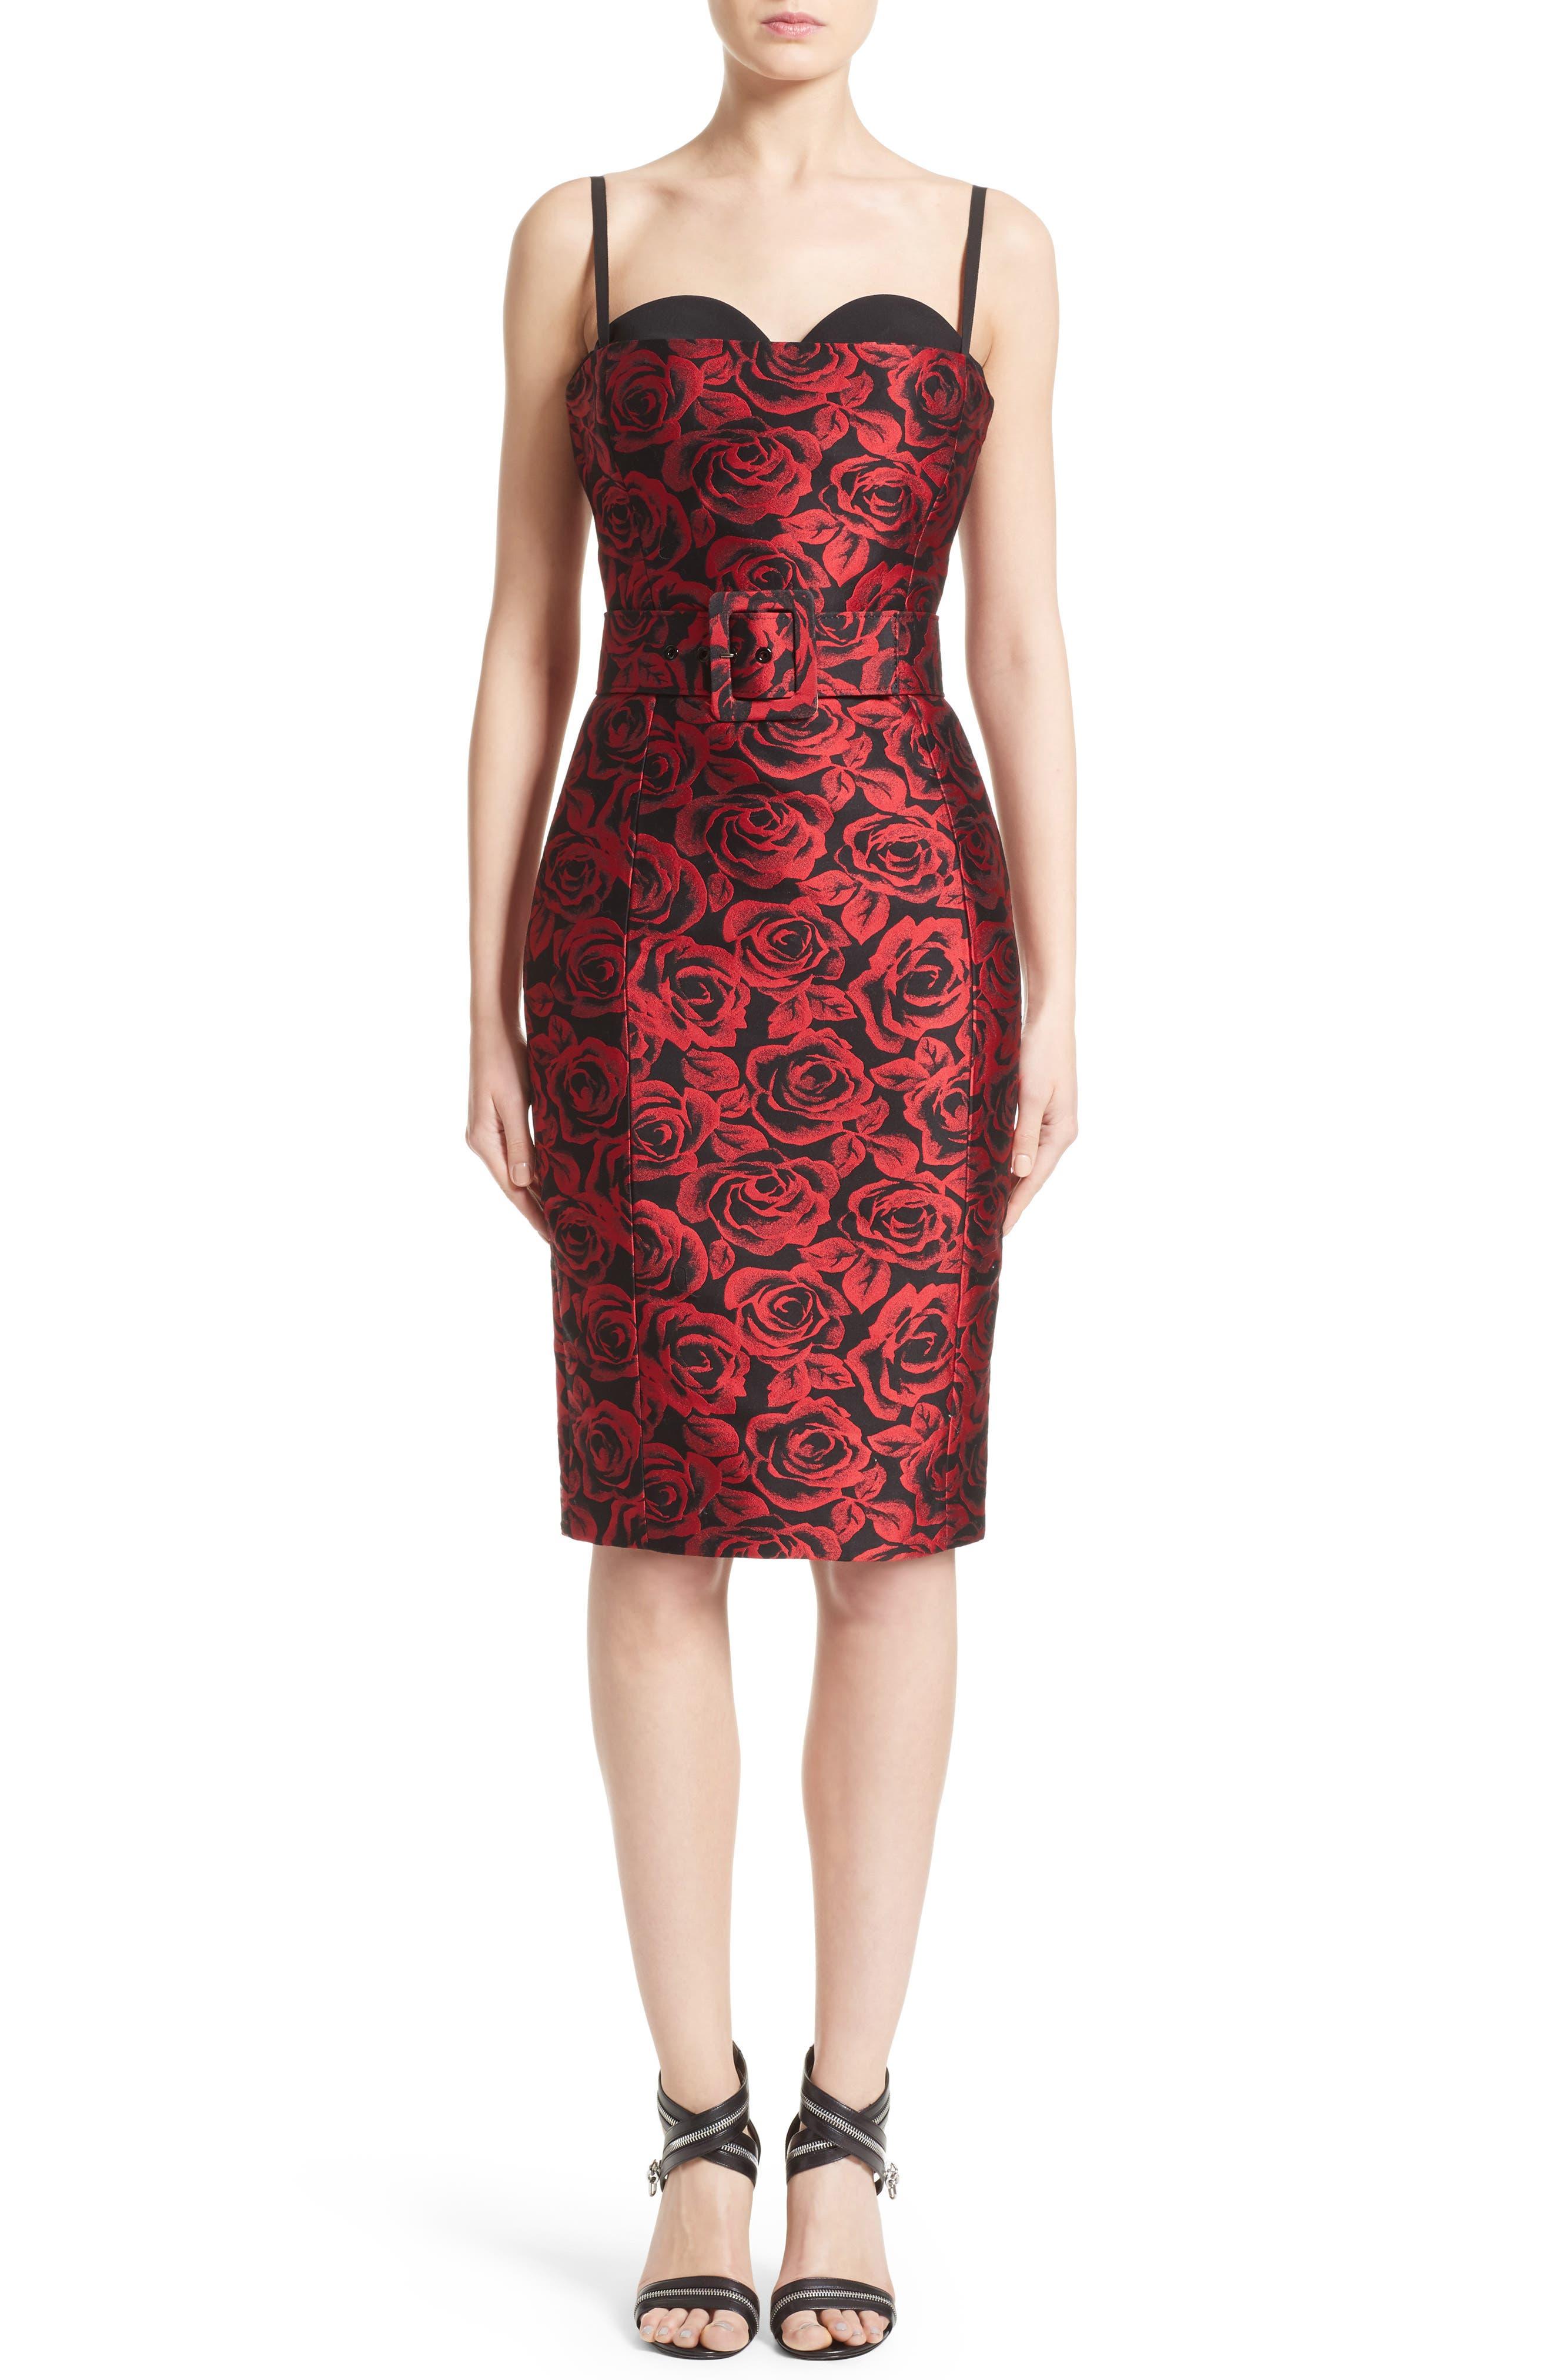 Michael Kors Rose Jacquard Bustier Sheath Dress